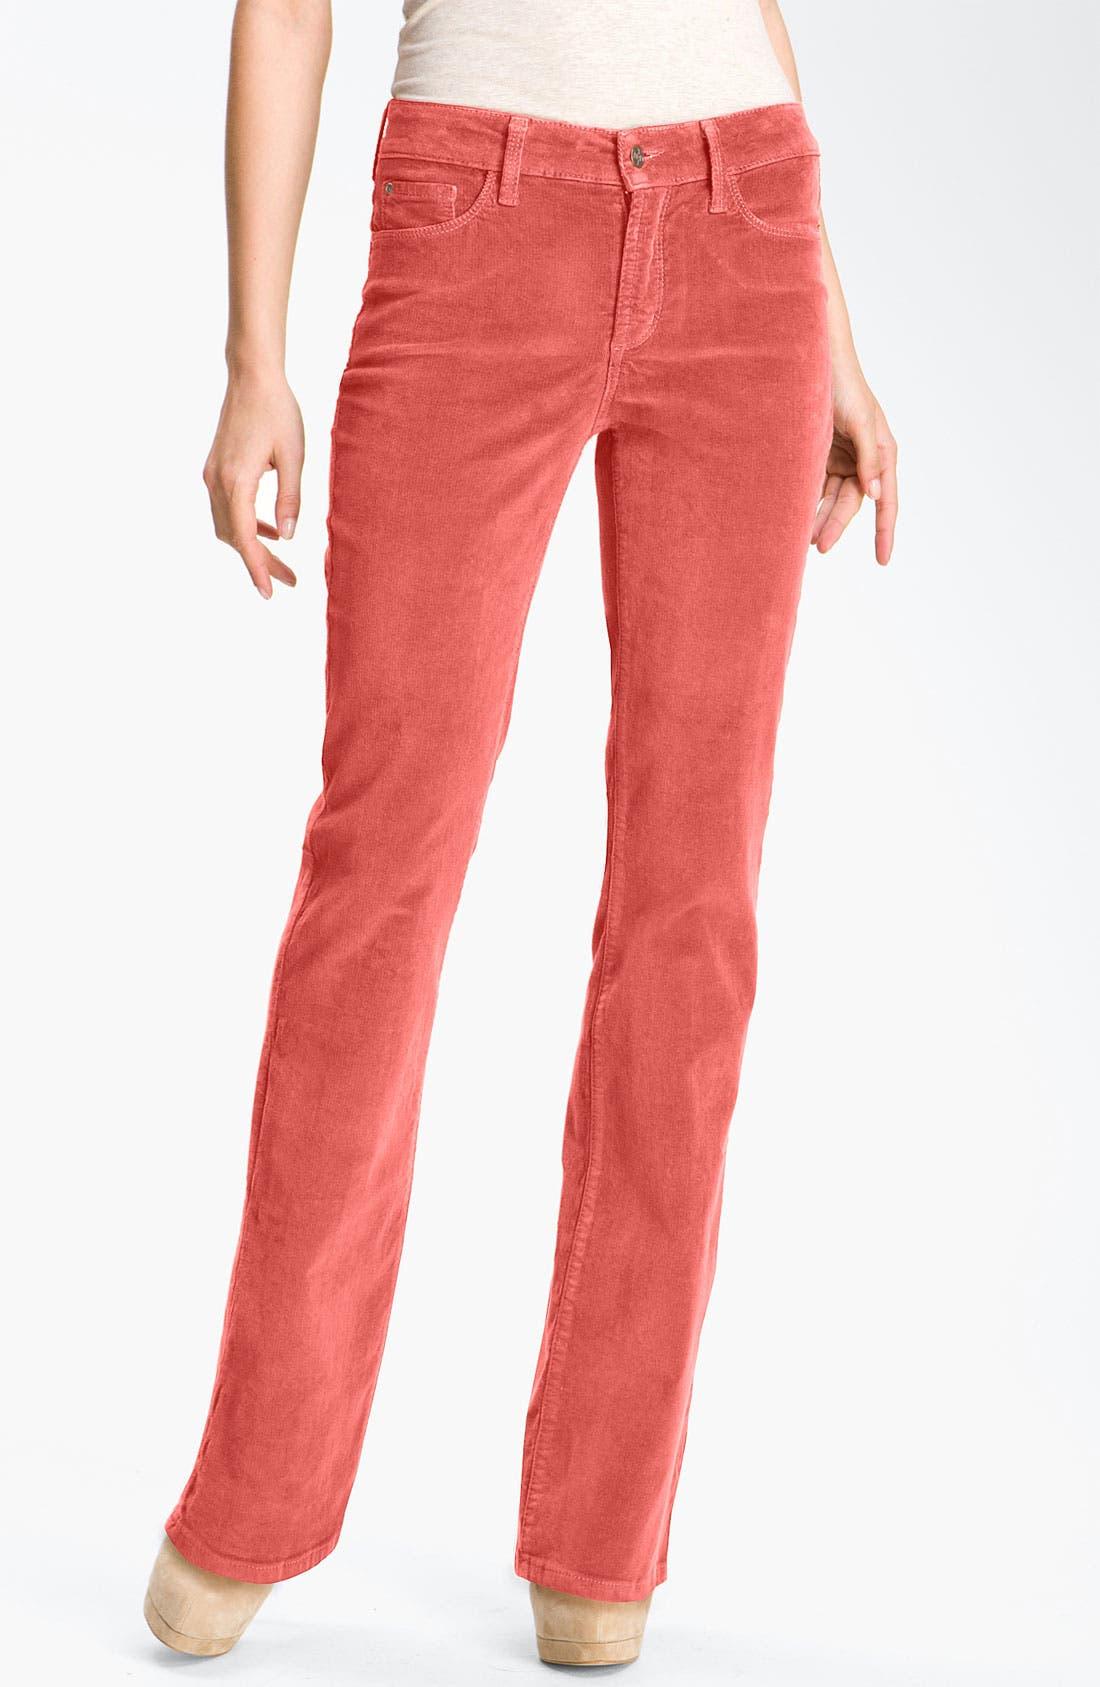 Alternate Image 1 Selected - NYDJ Bootcut Corduroy Jeans (Petite)